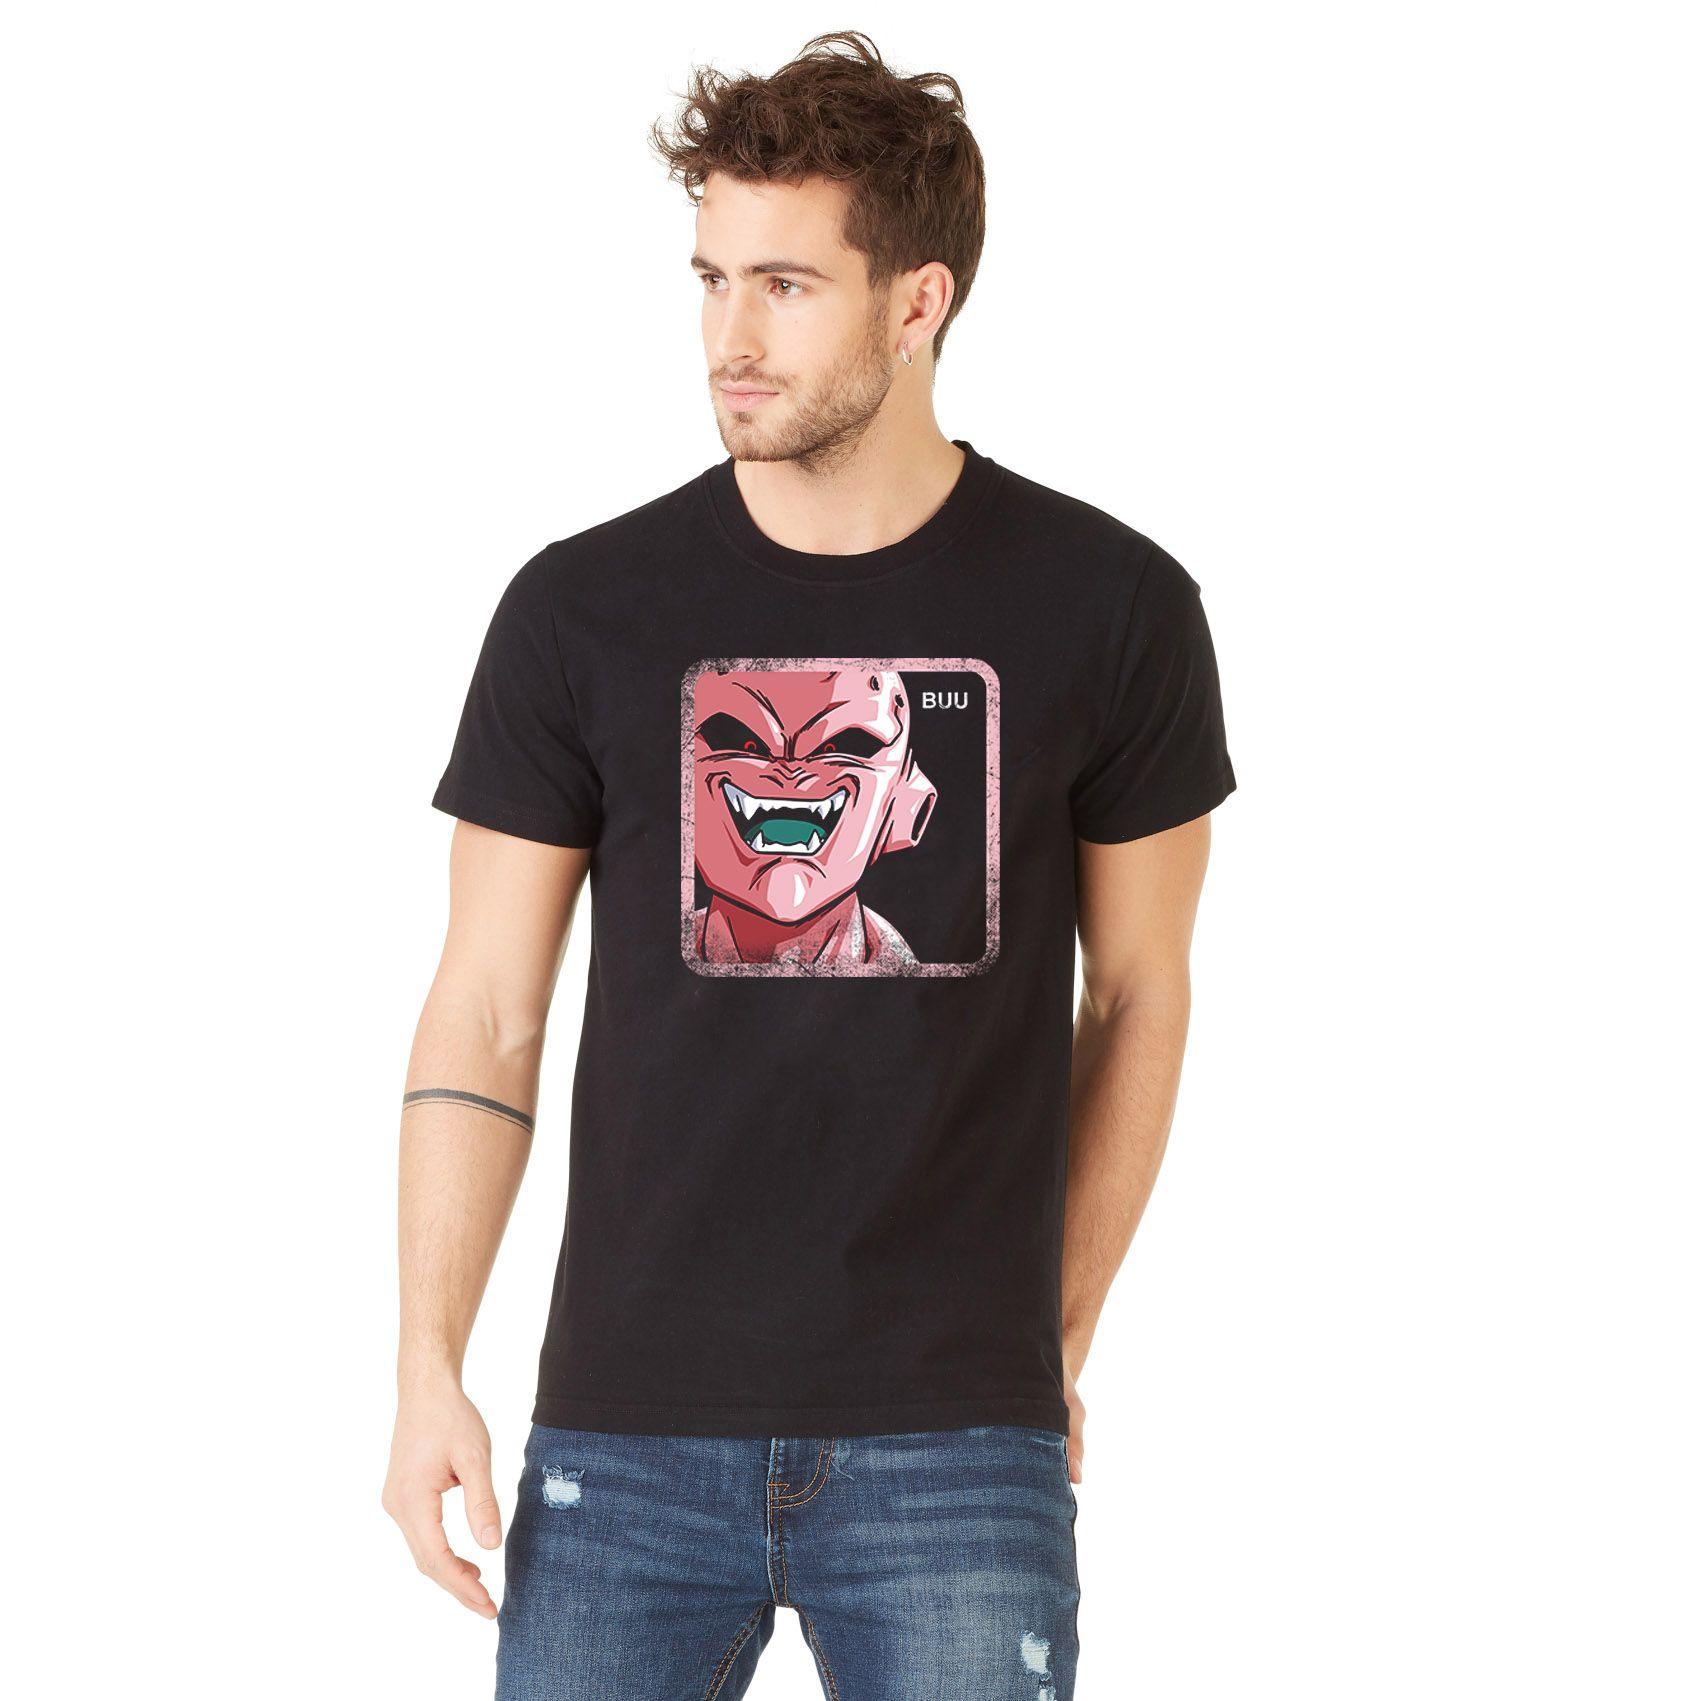 T-shirt coton homme dragon ball z buu noir